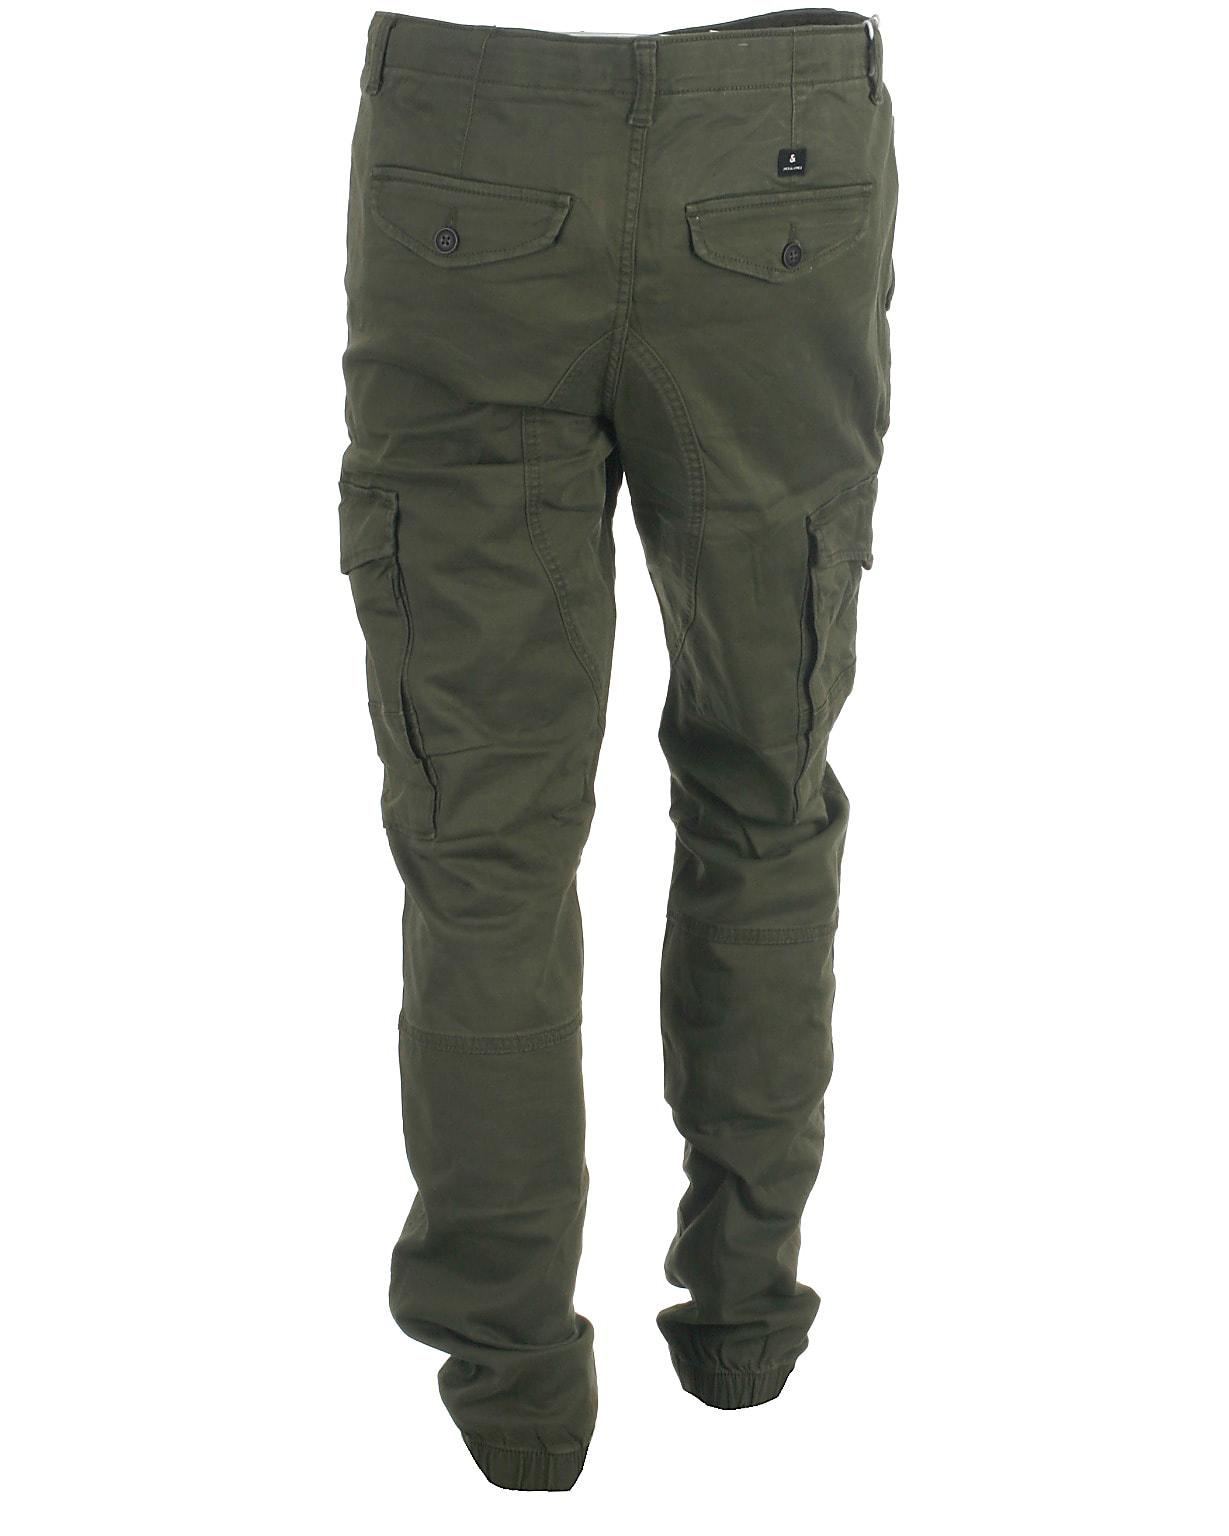 Image of Jack & Jones JR cargo pants, Paul, army